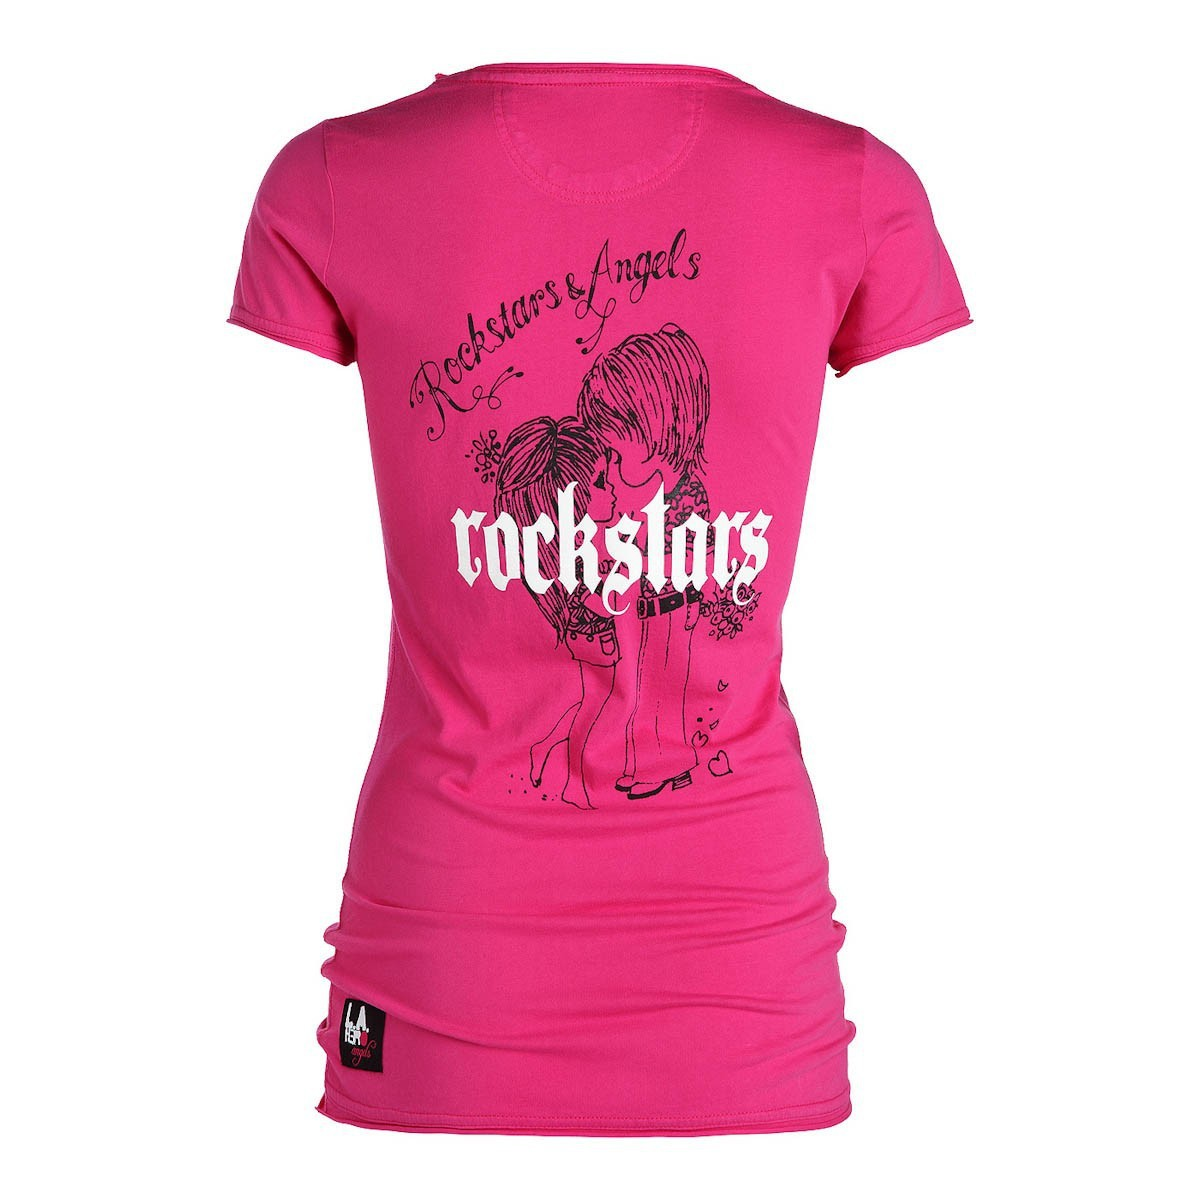 rockstars angels couple t shirt pink women t shirts. Black Bedroom Furniture Sets. Home Design Ideas